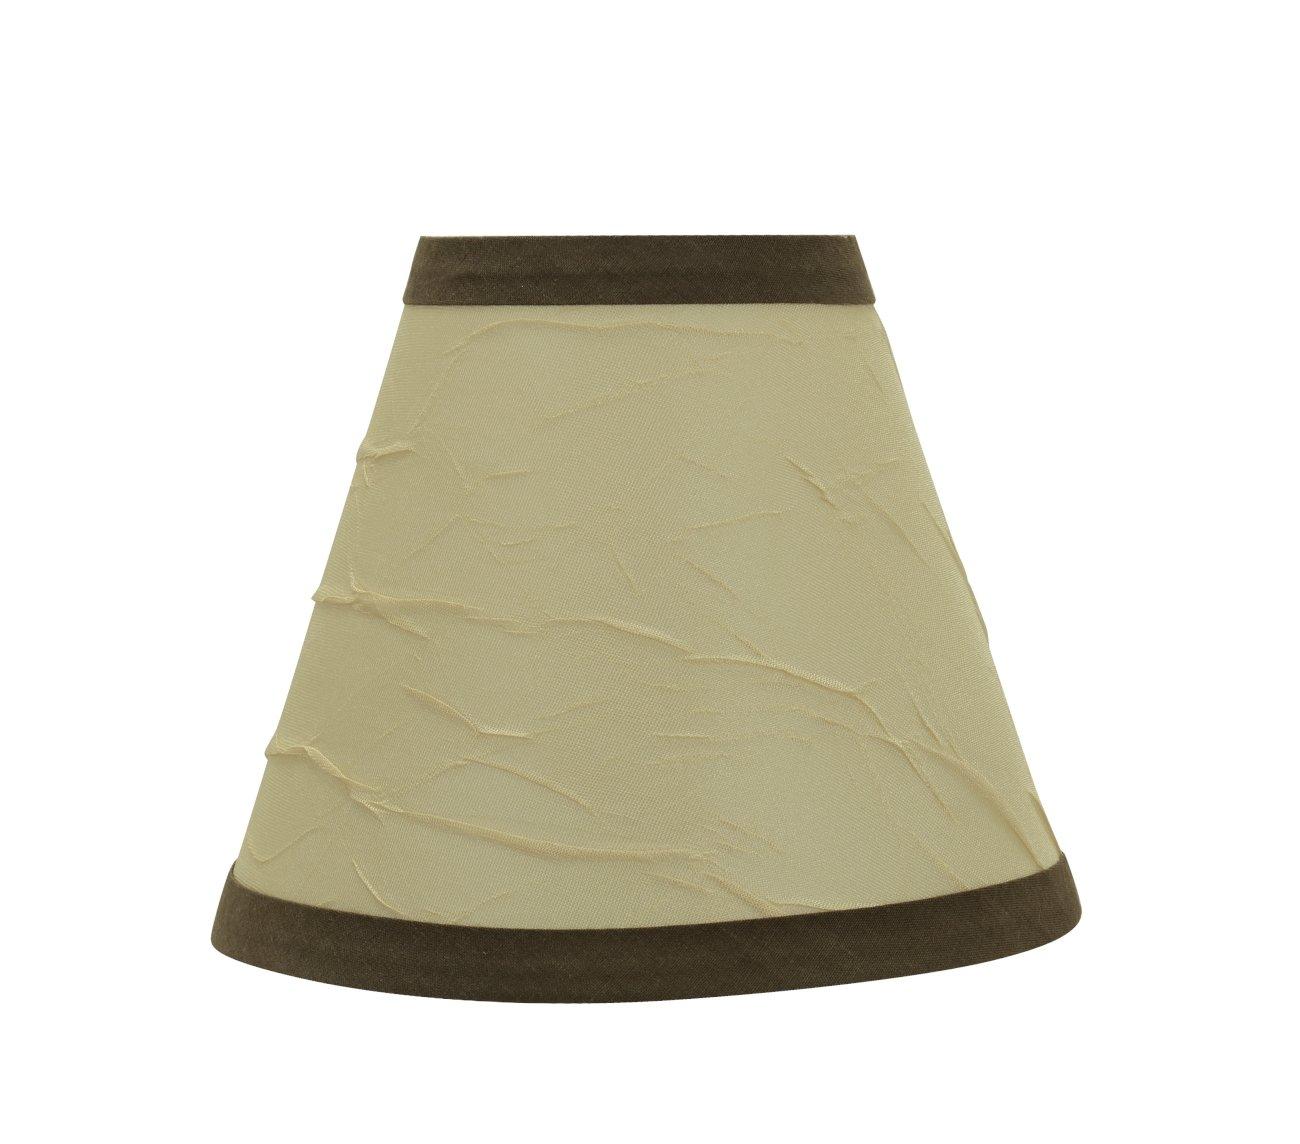 Aspen Creative 32121-2 Small Hardback Empire Shape Transitional Design in 3 X 6 X 5 Chandelier Clip-On Lamp Shade Set 2 Pack Beige 6 Bottom Width